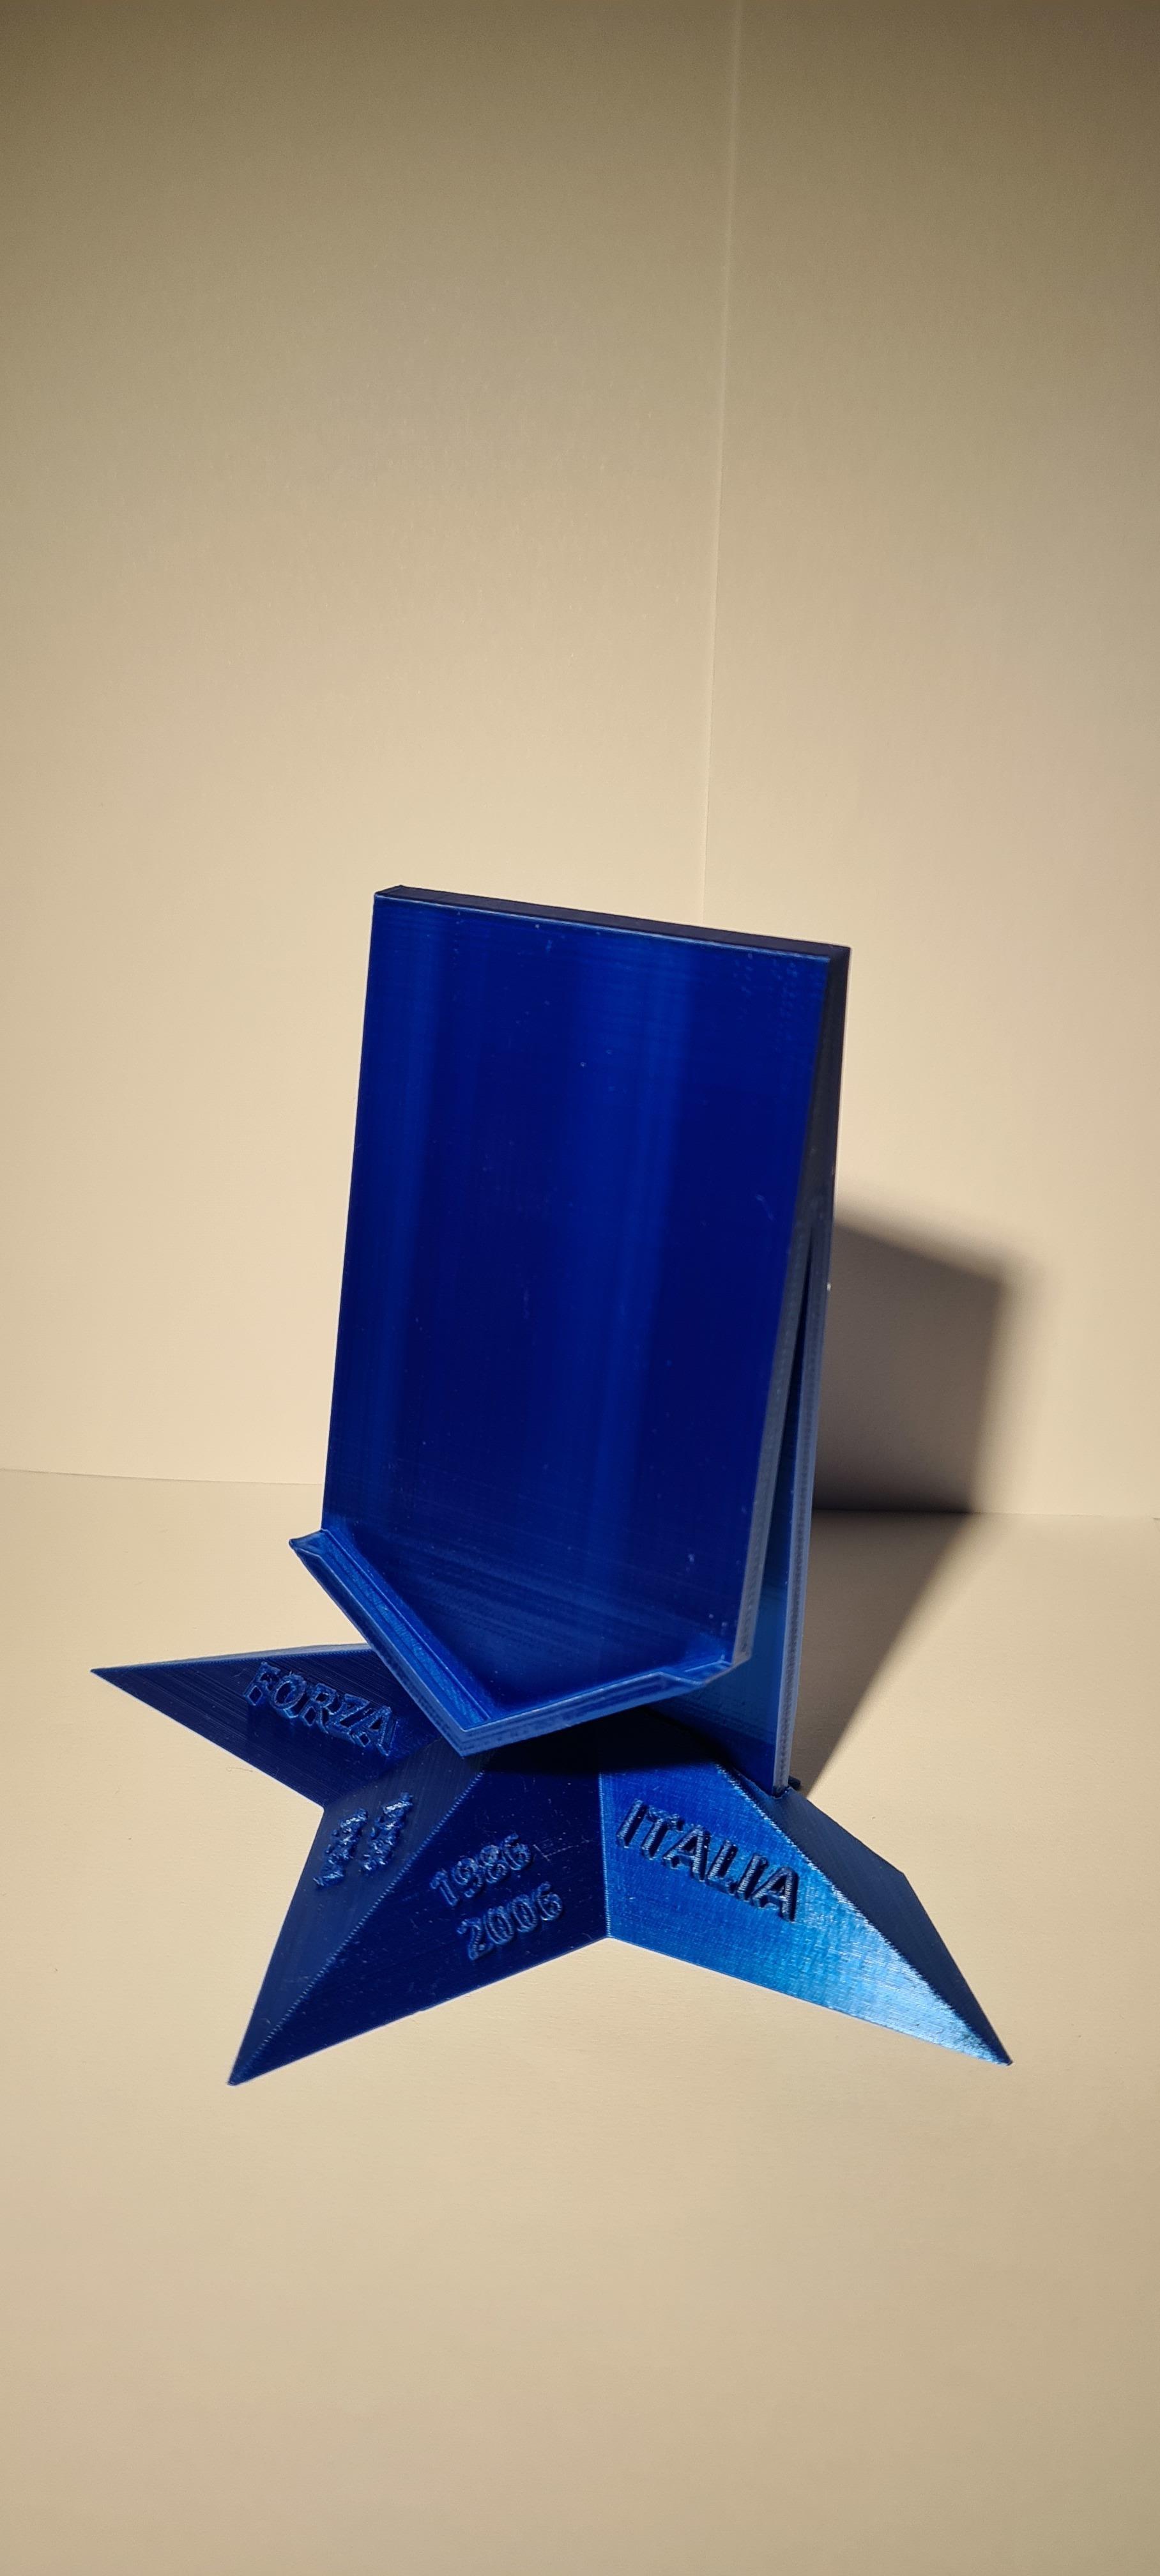 20201017_161943.jpg Télécharger fichier STL Logo italia figc • Objet imprimable en 3D, zimatera